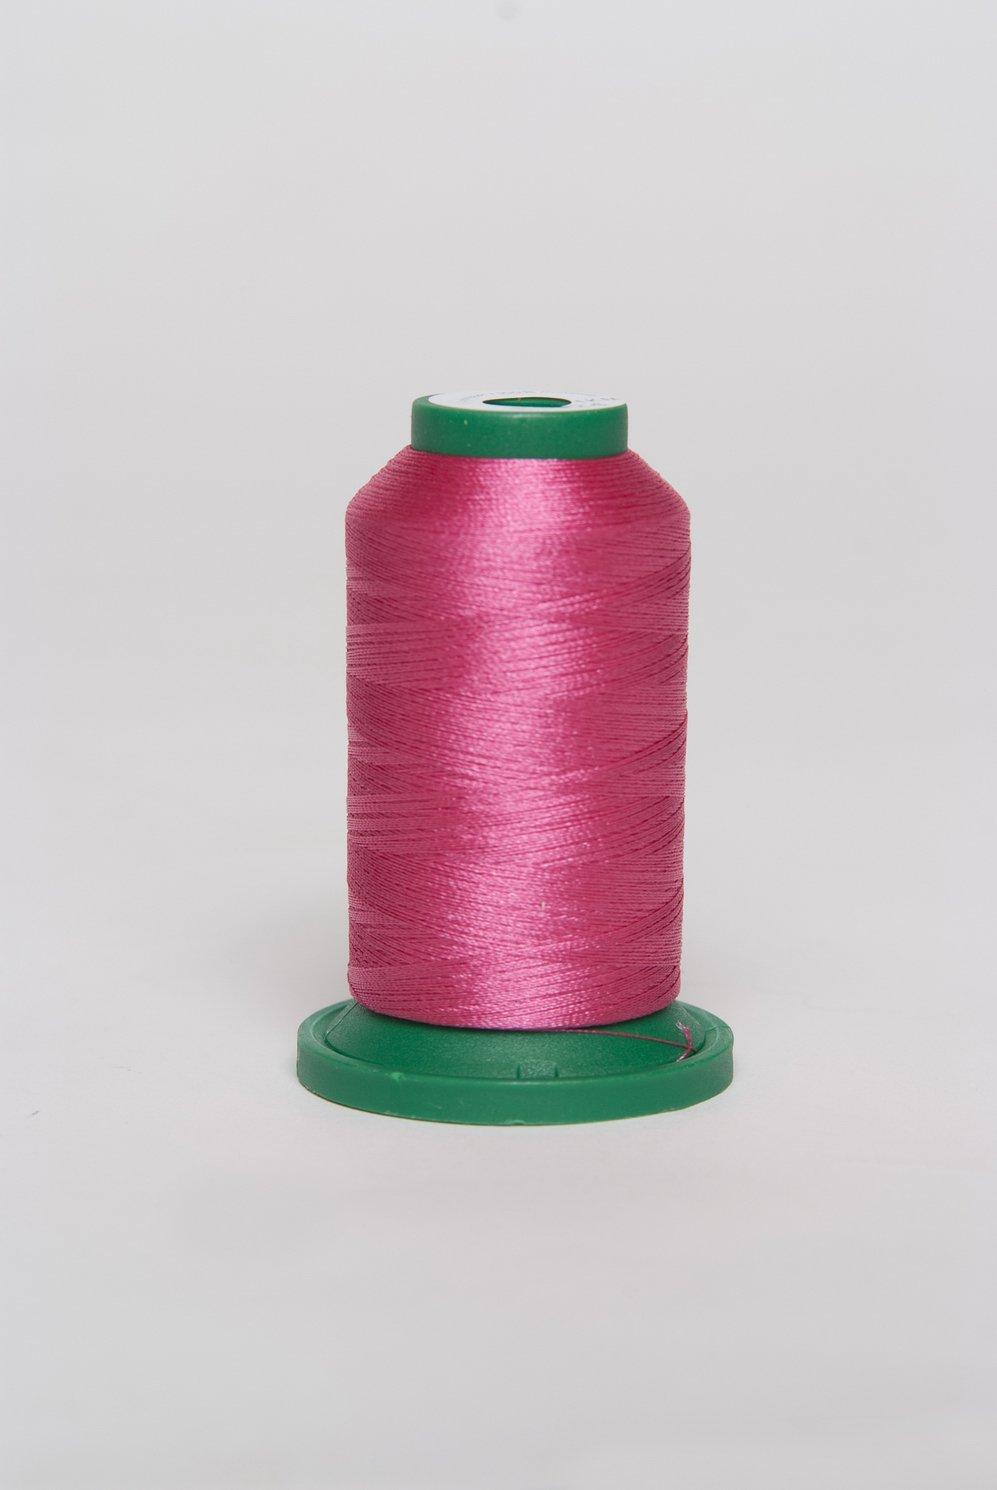 Cabernet - ES324 - Exquisite Embroidery Thread - 1000 meters